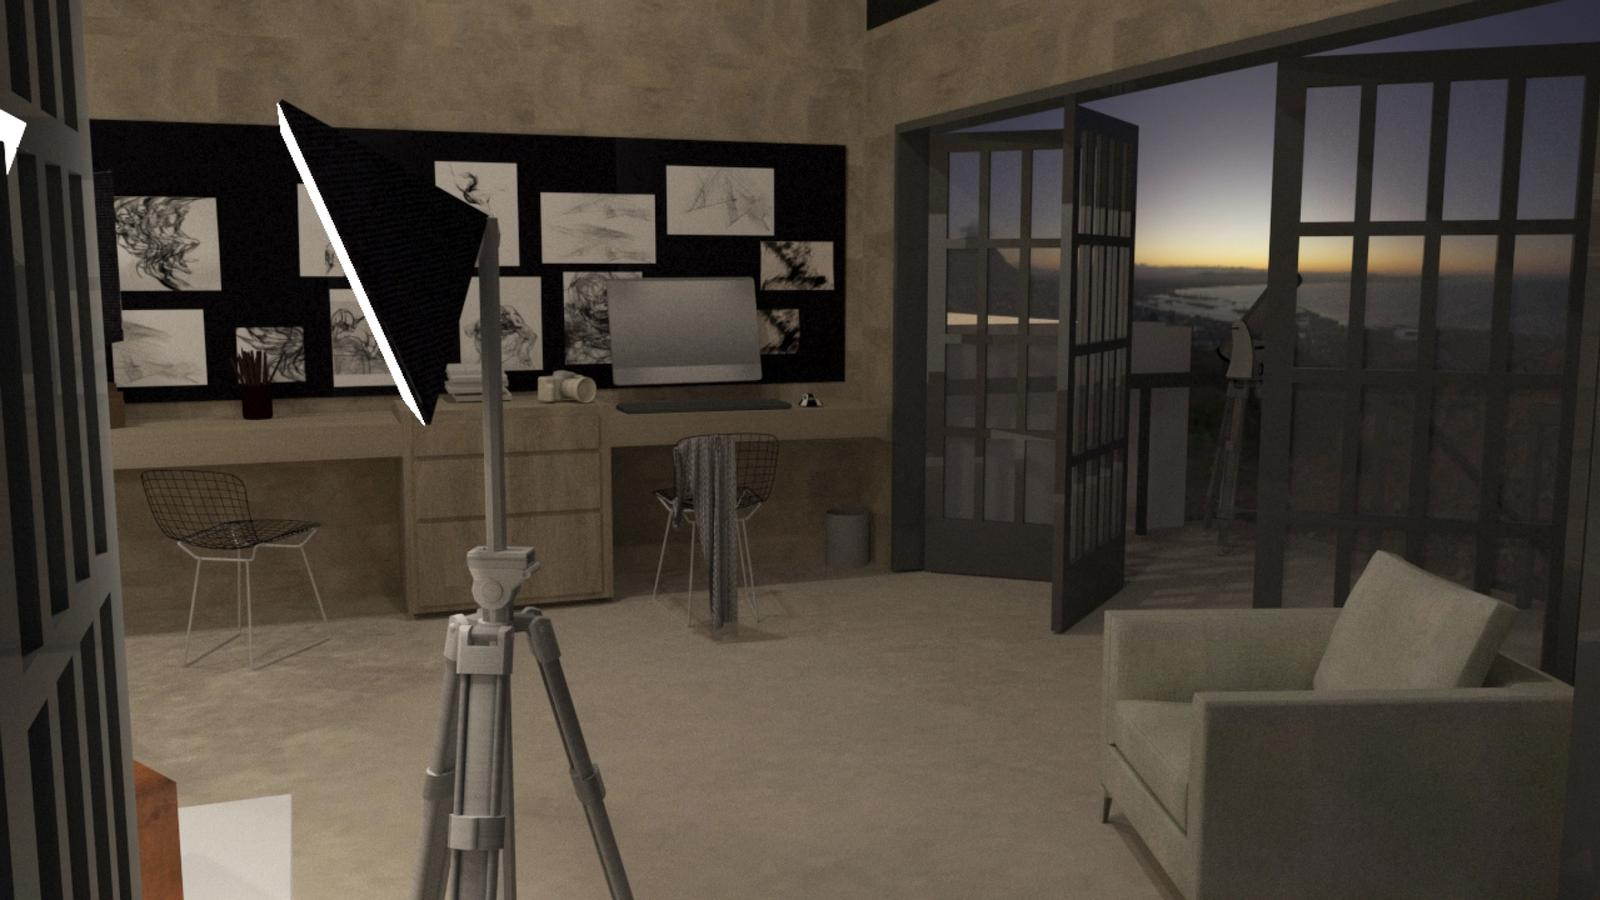 Artist Studio Loft - Studio in the Evening